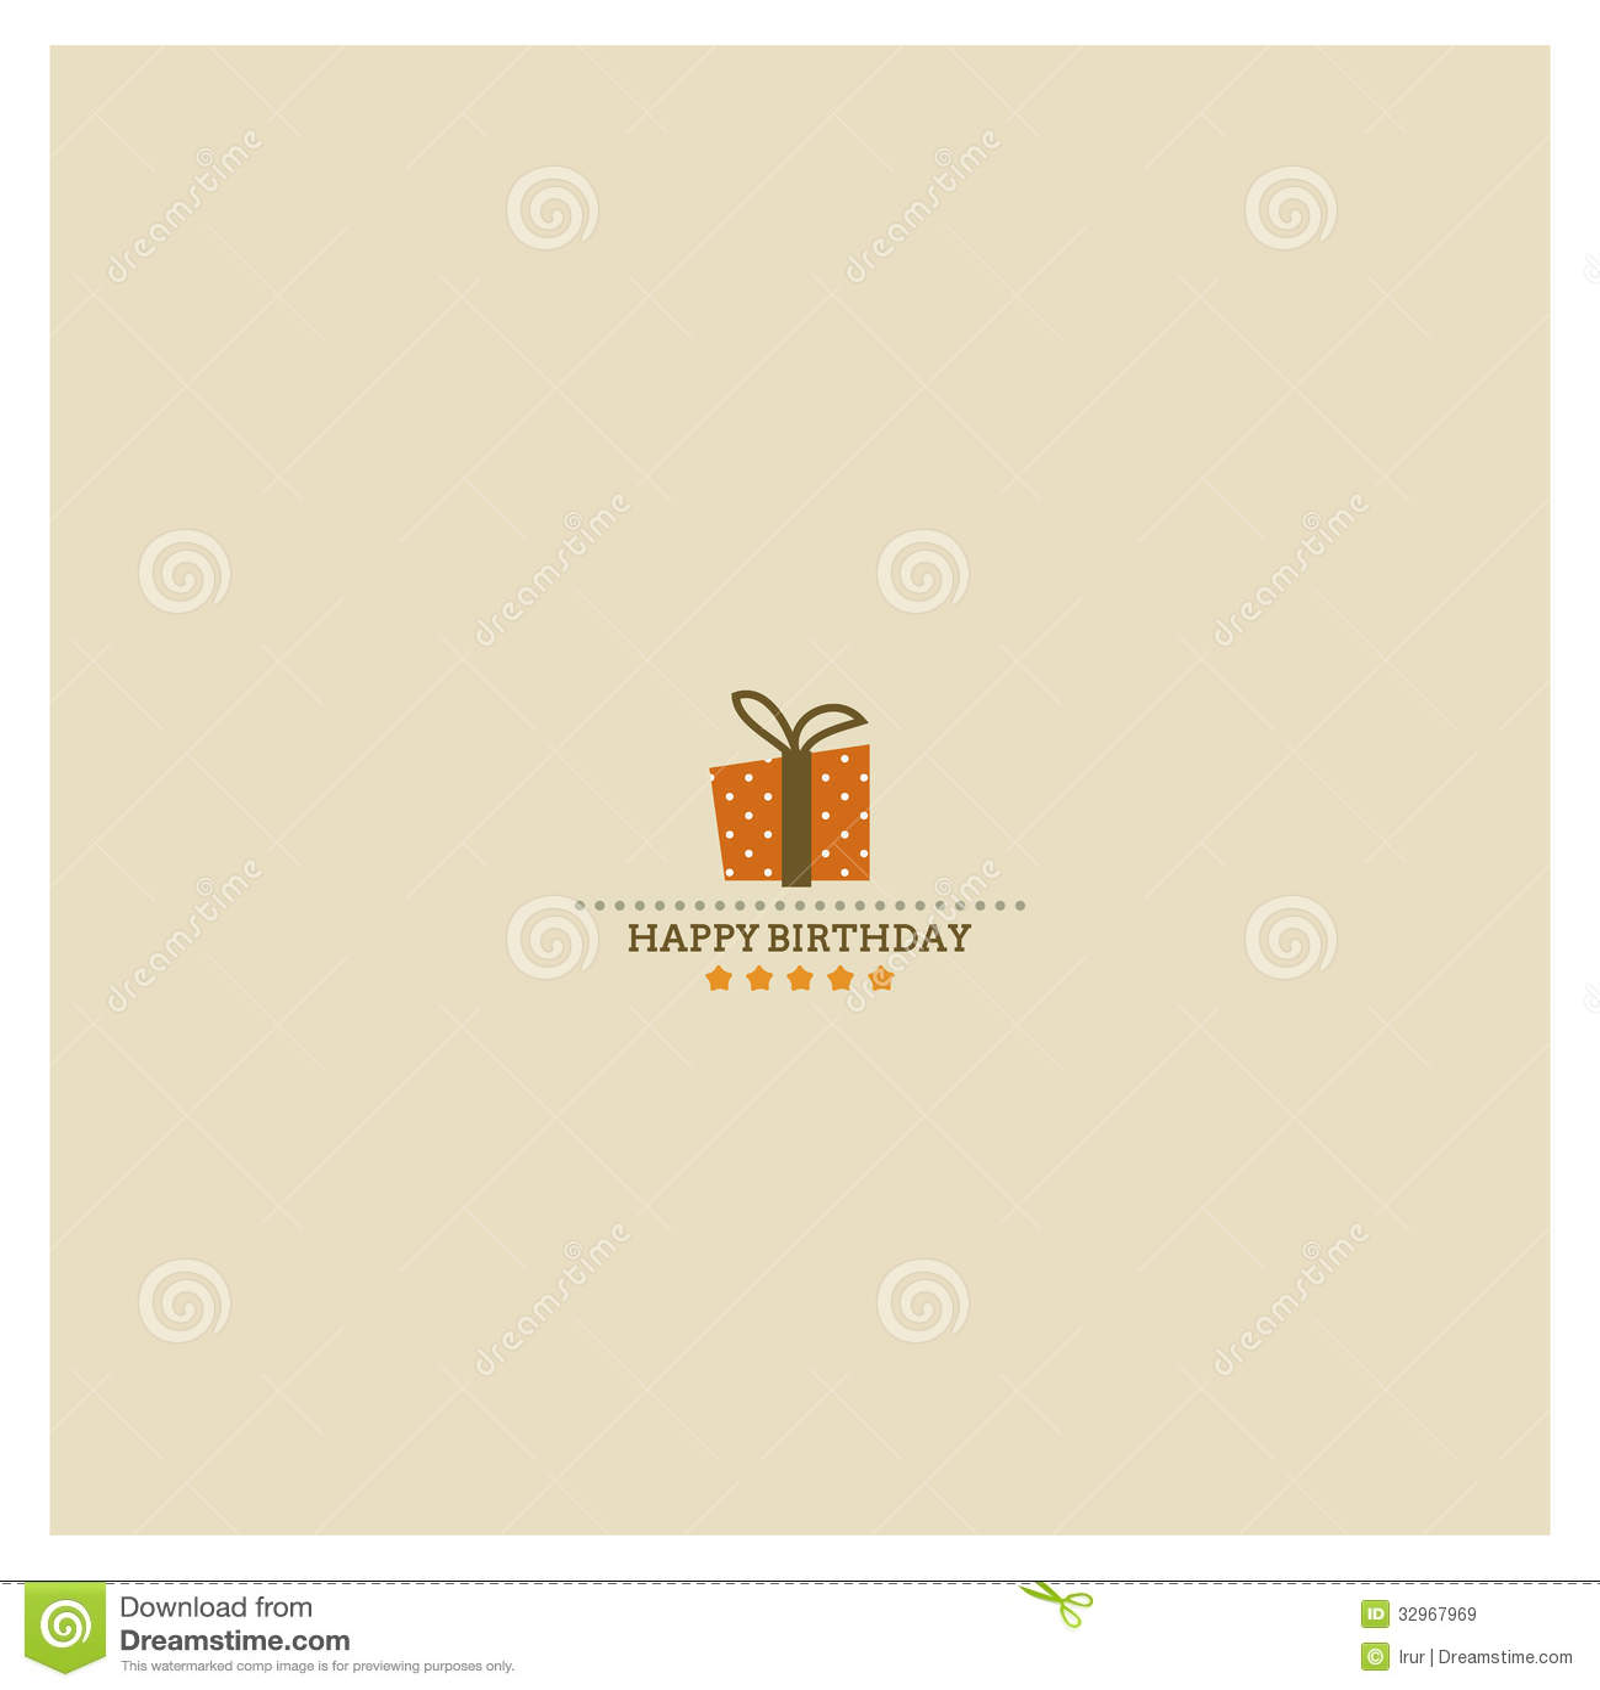 Happy Birthday card with holiday polka dot gift bo